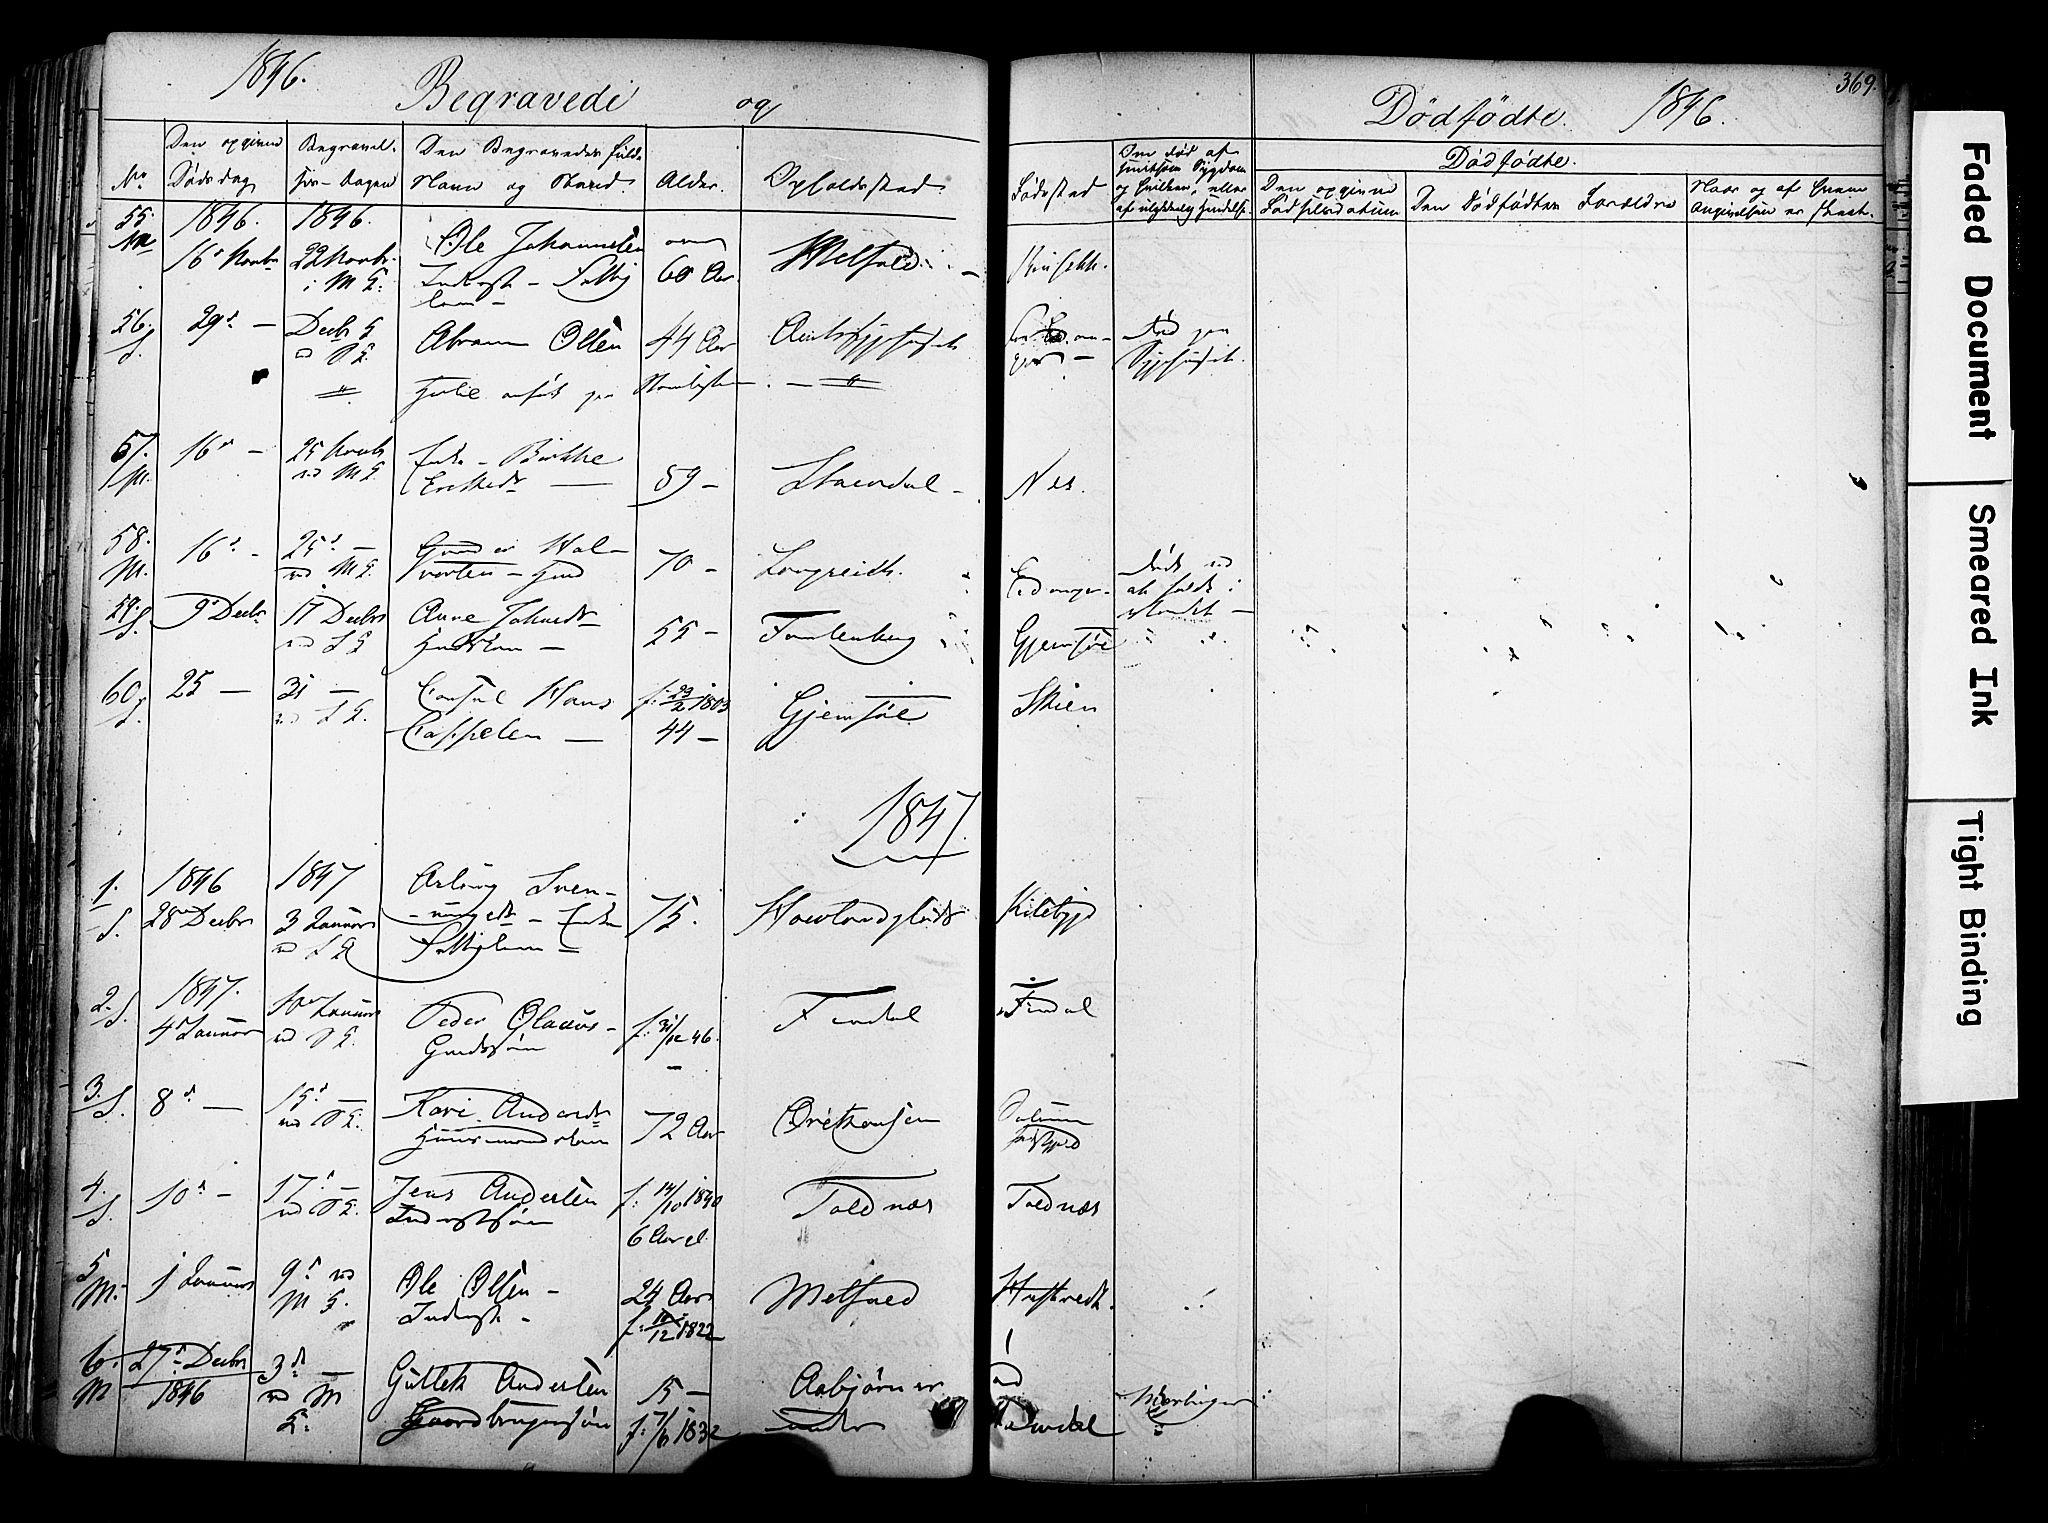 SAKO, Solum kirkebøker, F/Fa/L0006: Ministerialbok nr. I 6, 1844-1855, s. 369